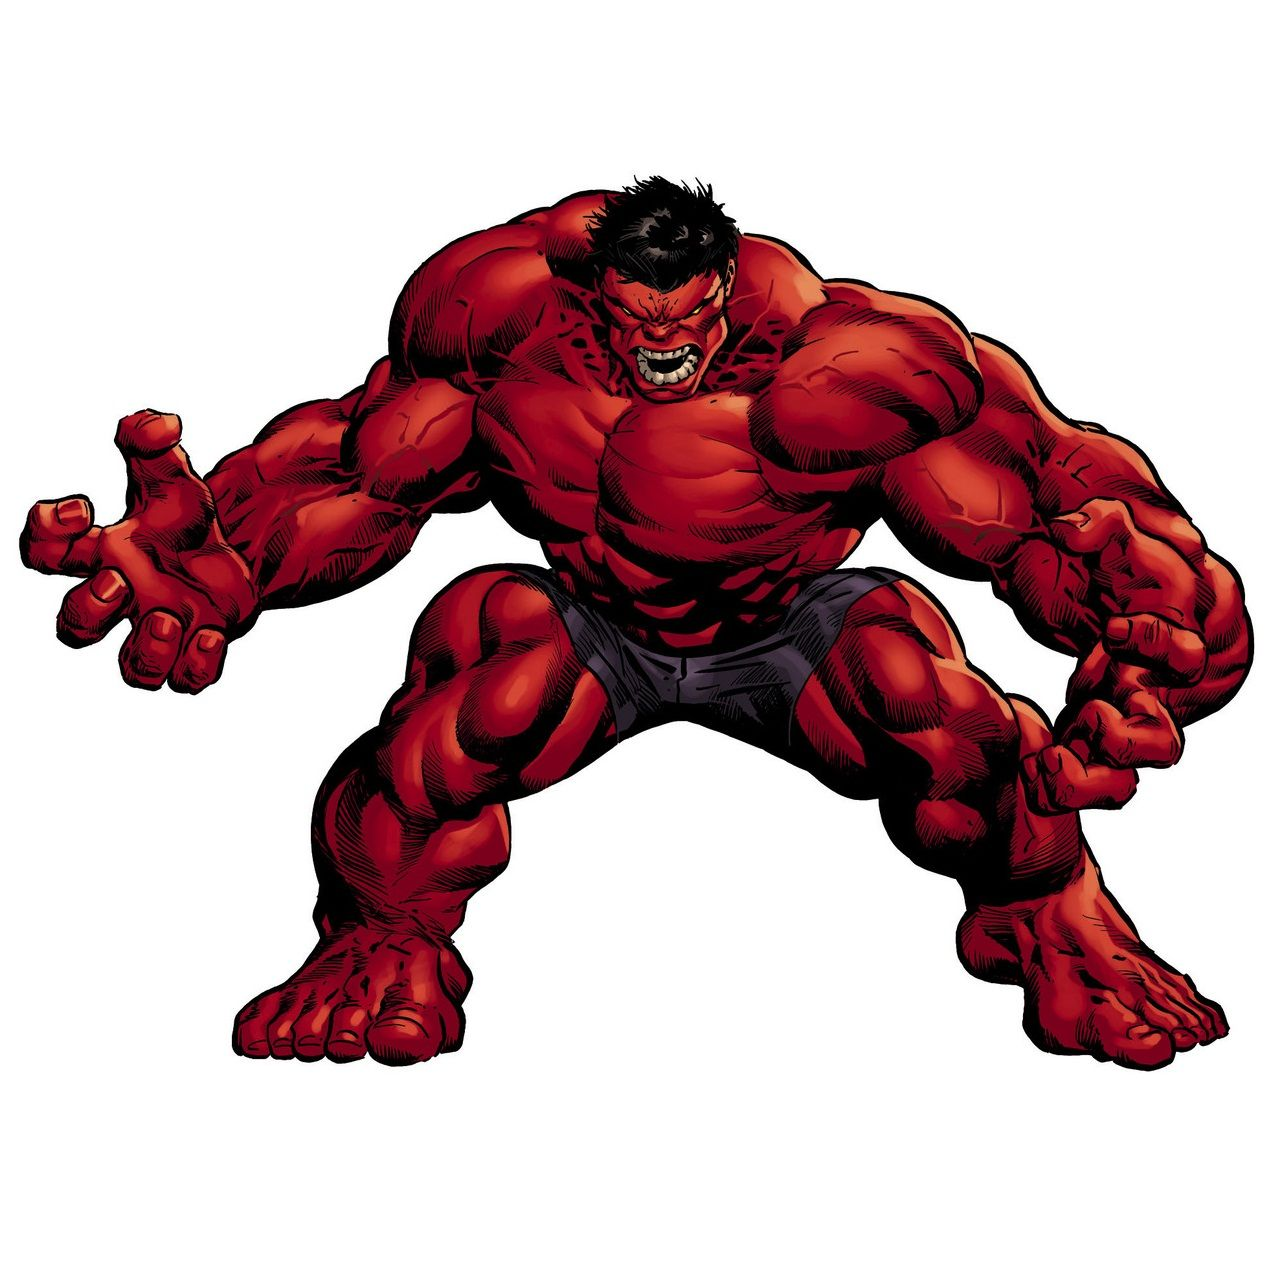 #Red #Hulk #Clip #Art. (THE * 5 * STÅR * ÅWARD * OF: * AW YEAH, IT'S MAJOR ÅWESOMENESS!!!™)[THANK U 4 PINNING!!!<·><]<©>ÅÅÅ+(OB4E)